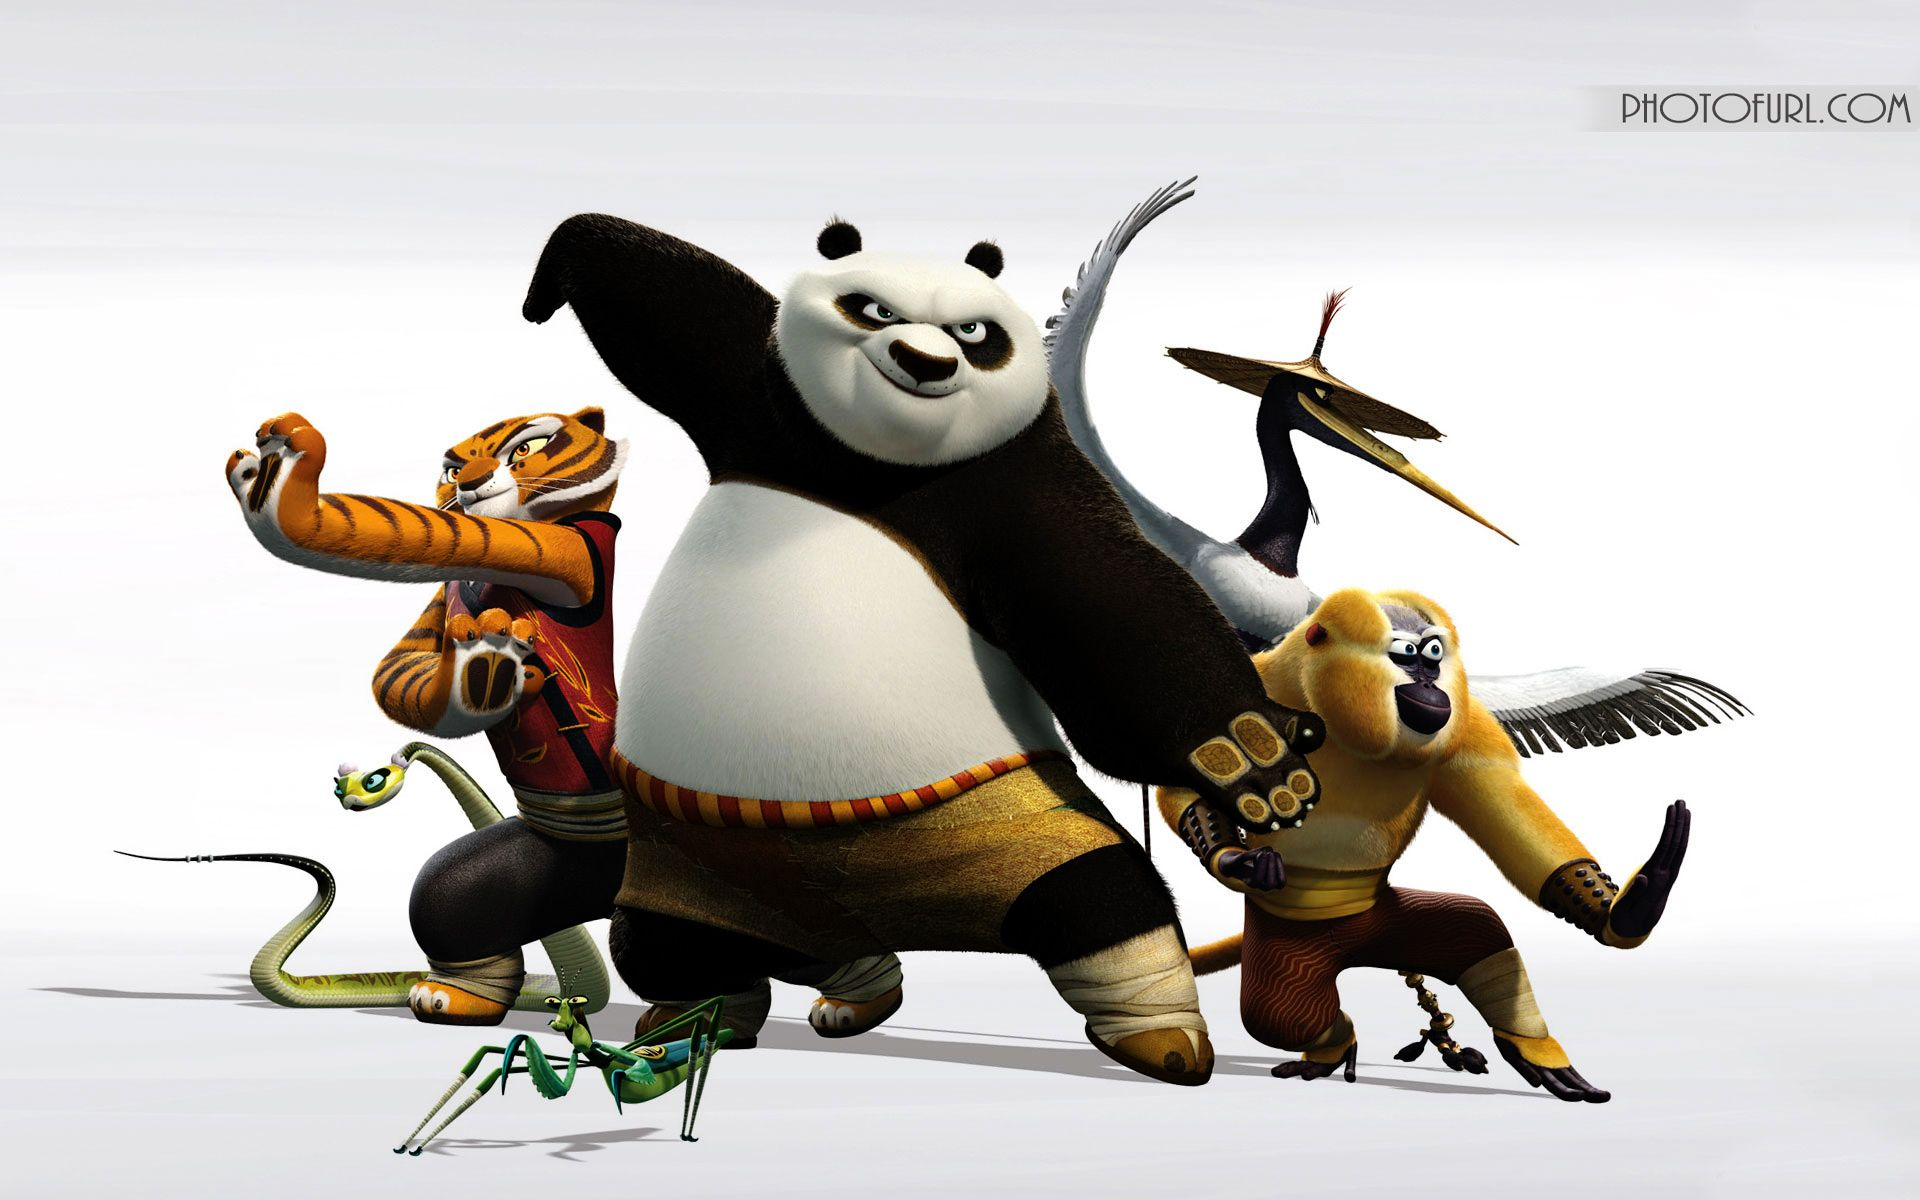 Free Full Cartoon Movies cartoon movies wallpapers - top free cartoon movies